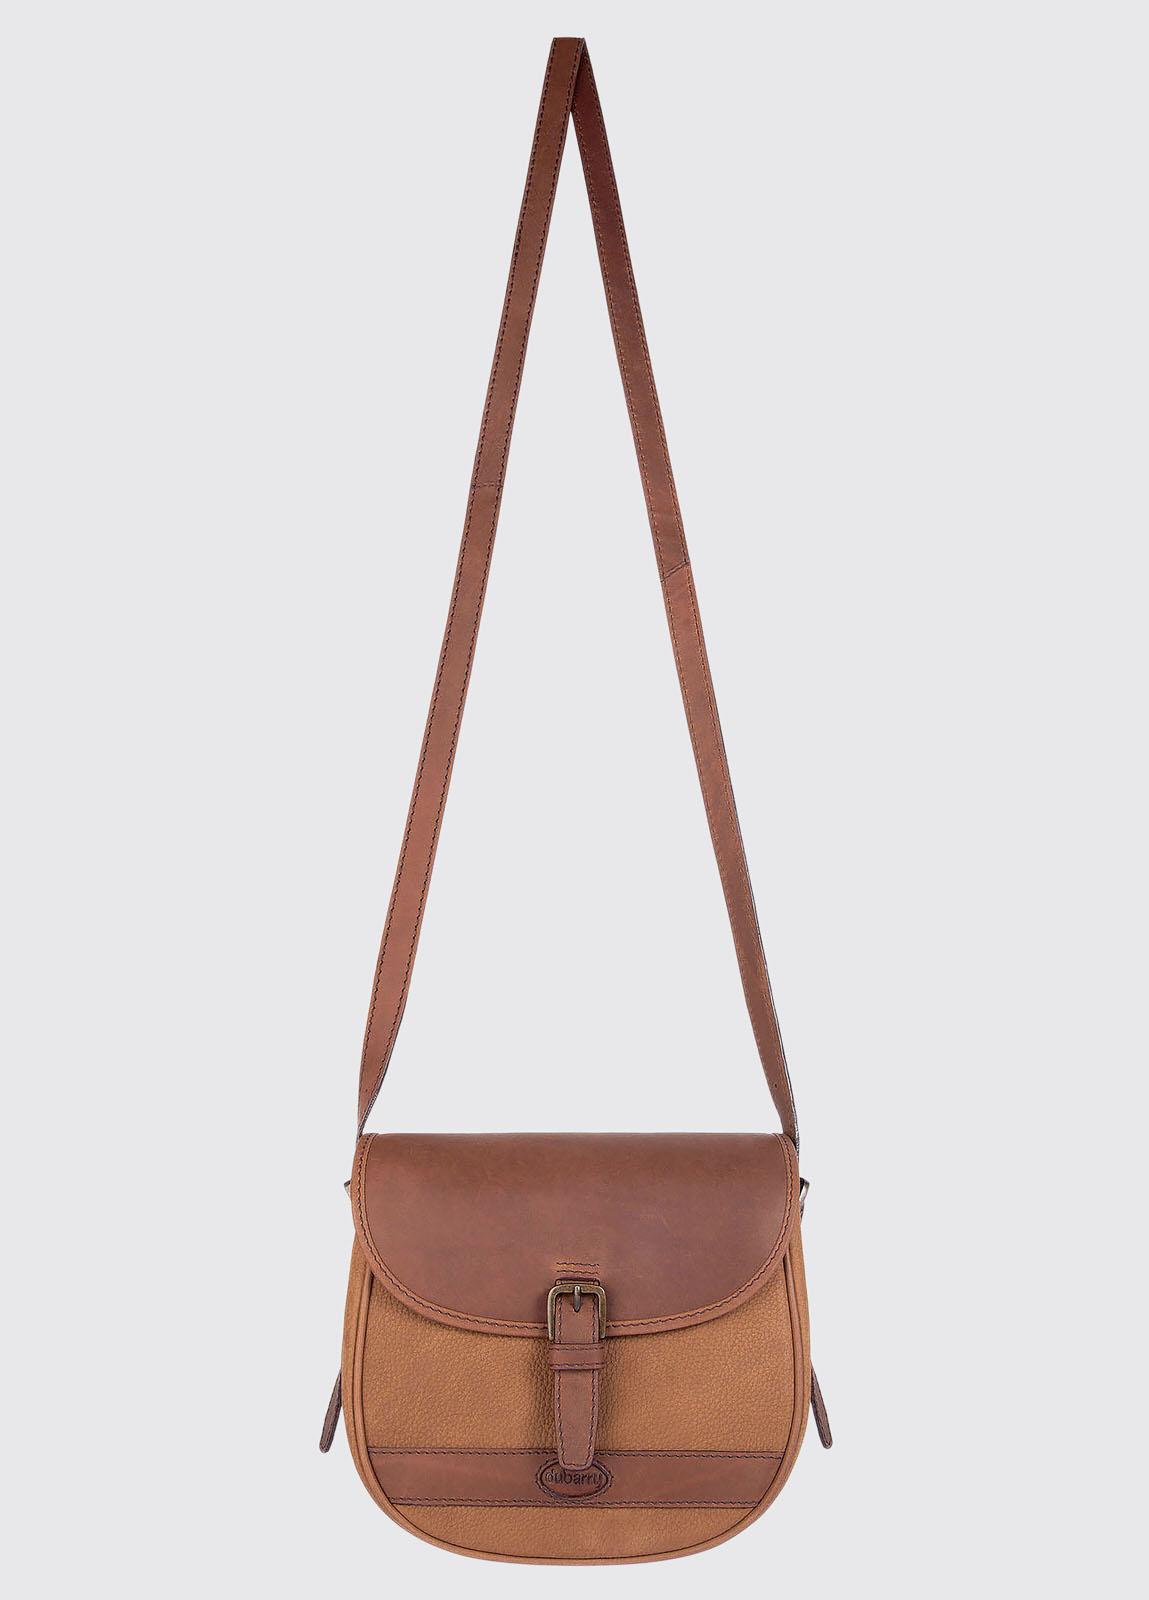 Clara Leather Saddle bag - Brown